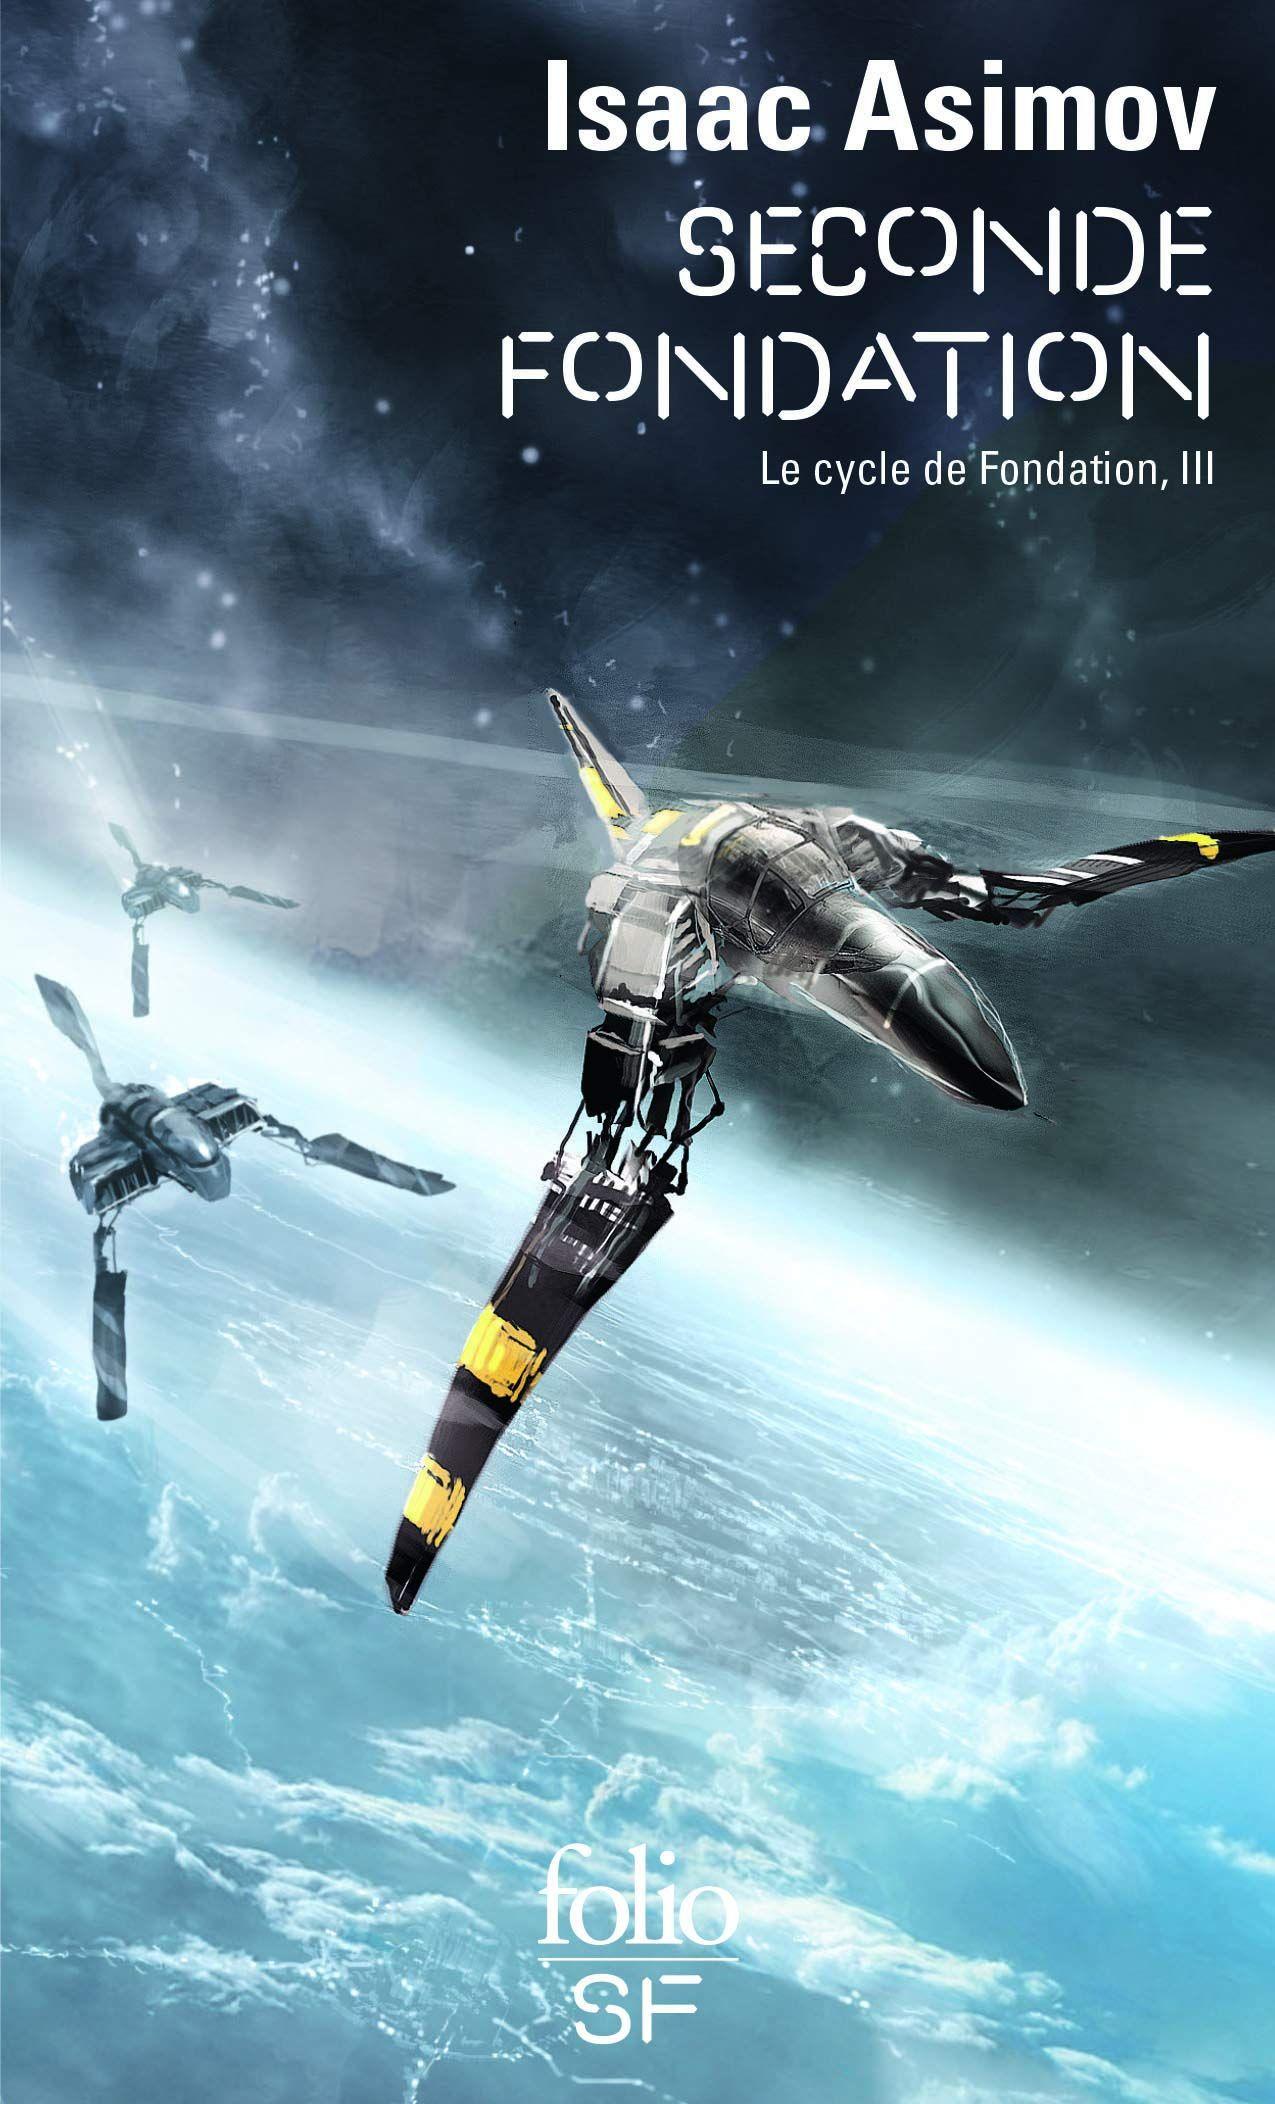 Seconde Fondation – Isaac Asimov